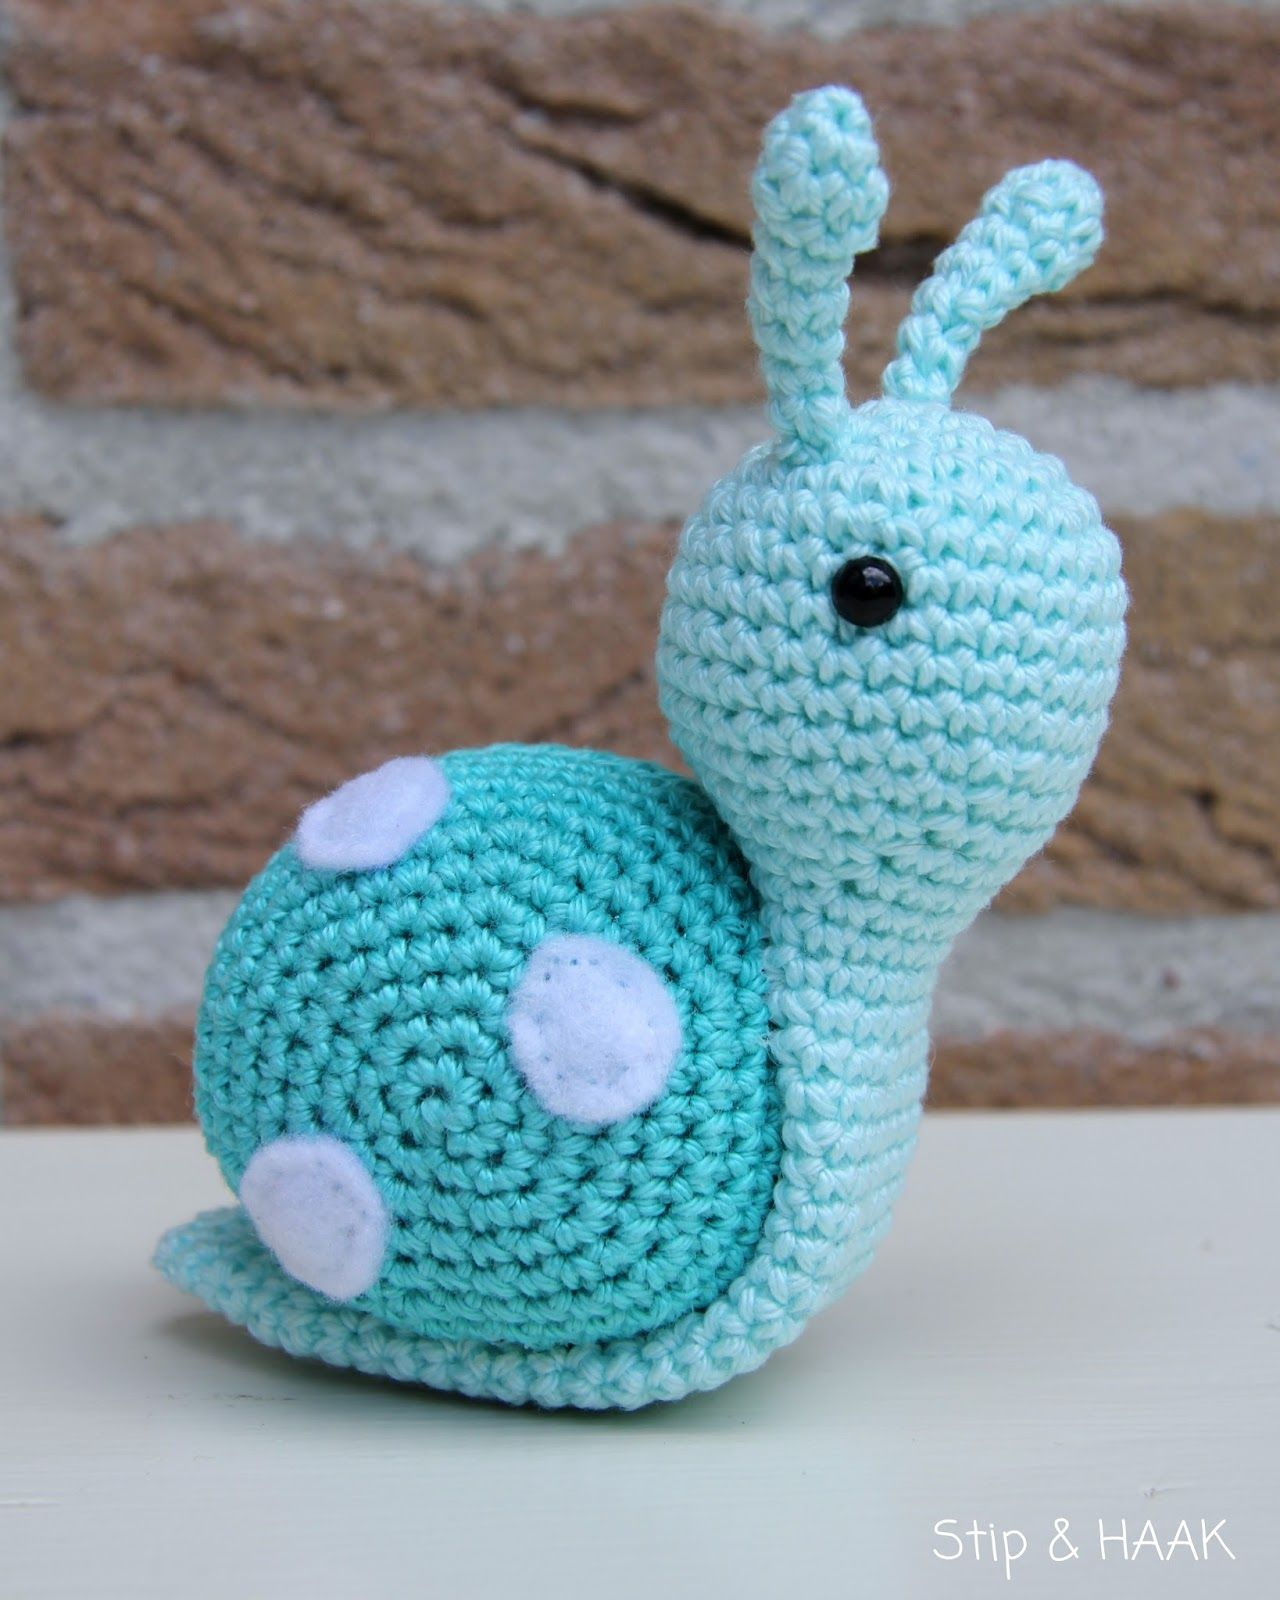 Crochet Häkel Pattern Schnecke Do It Yourself Diy Creativity